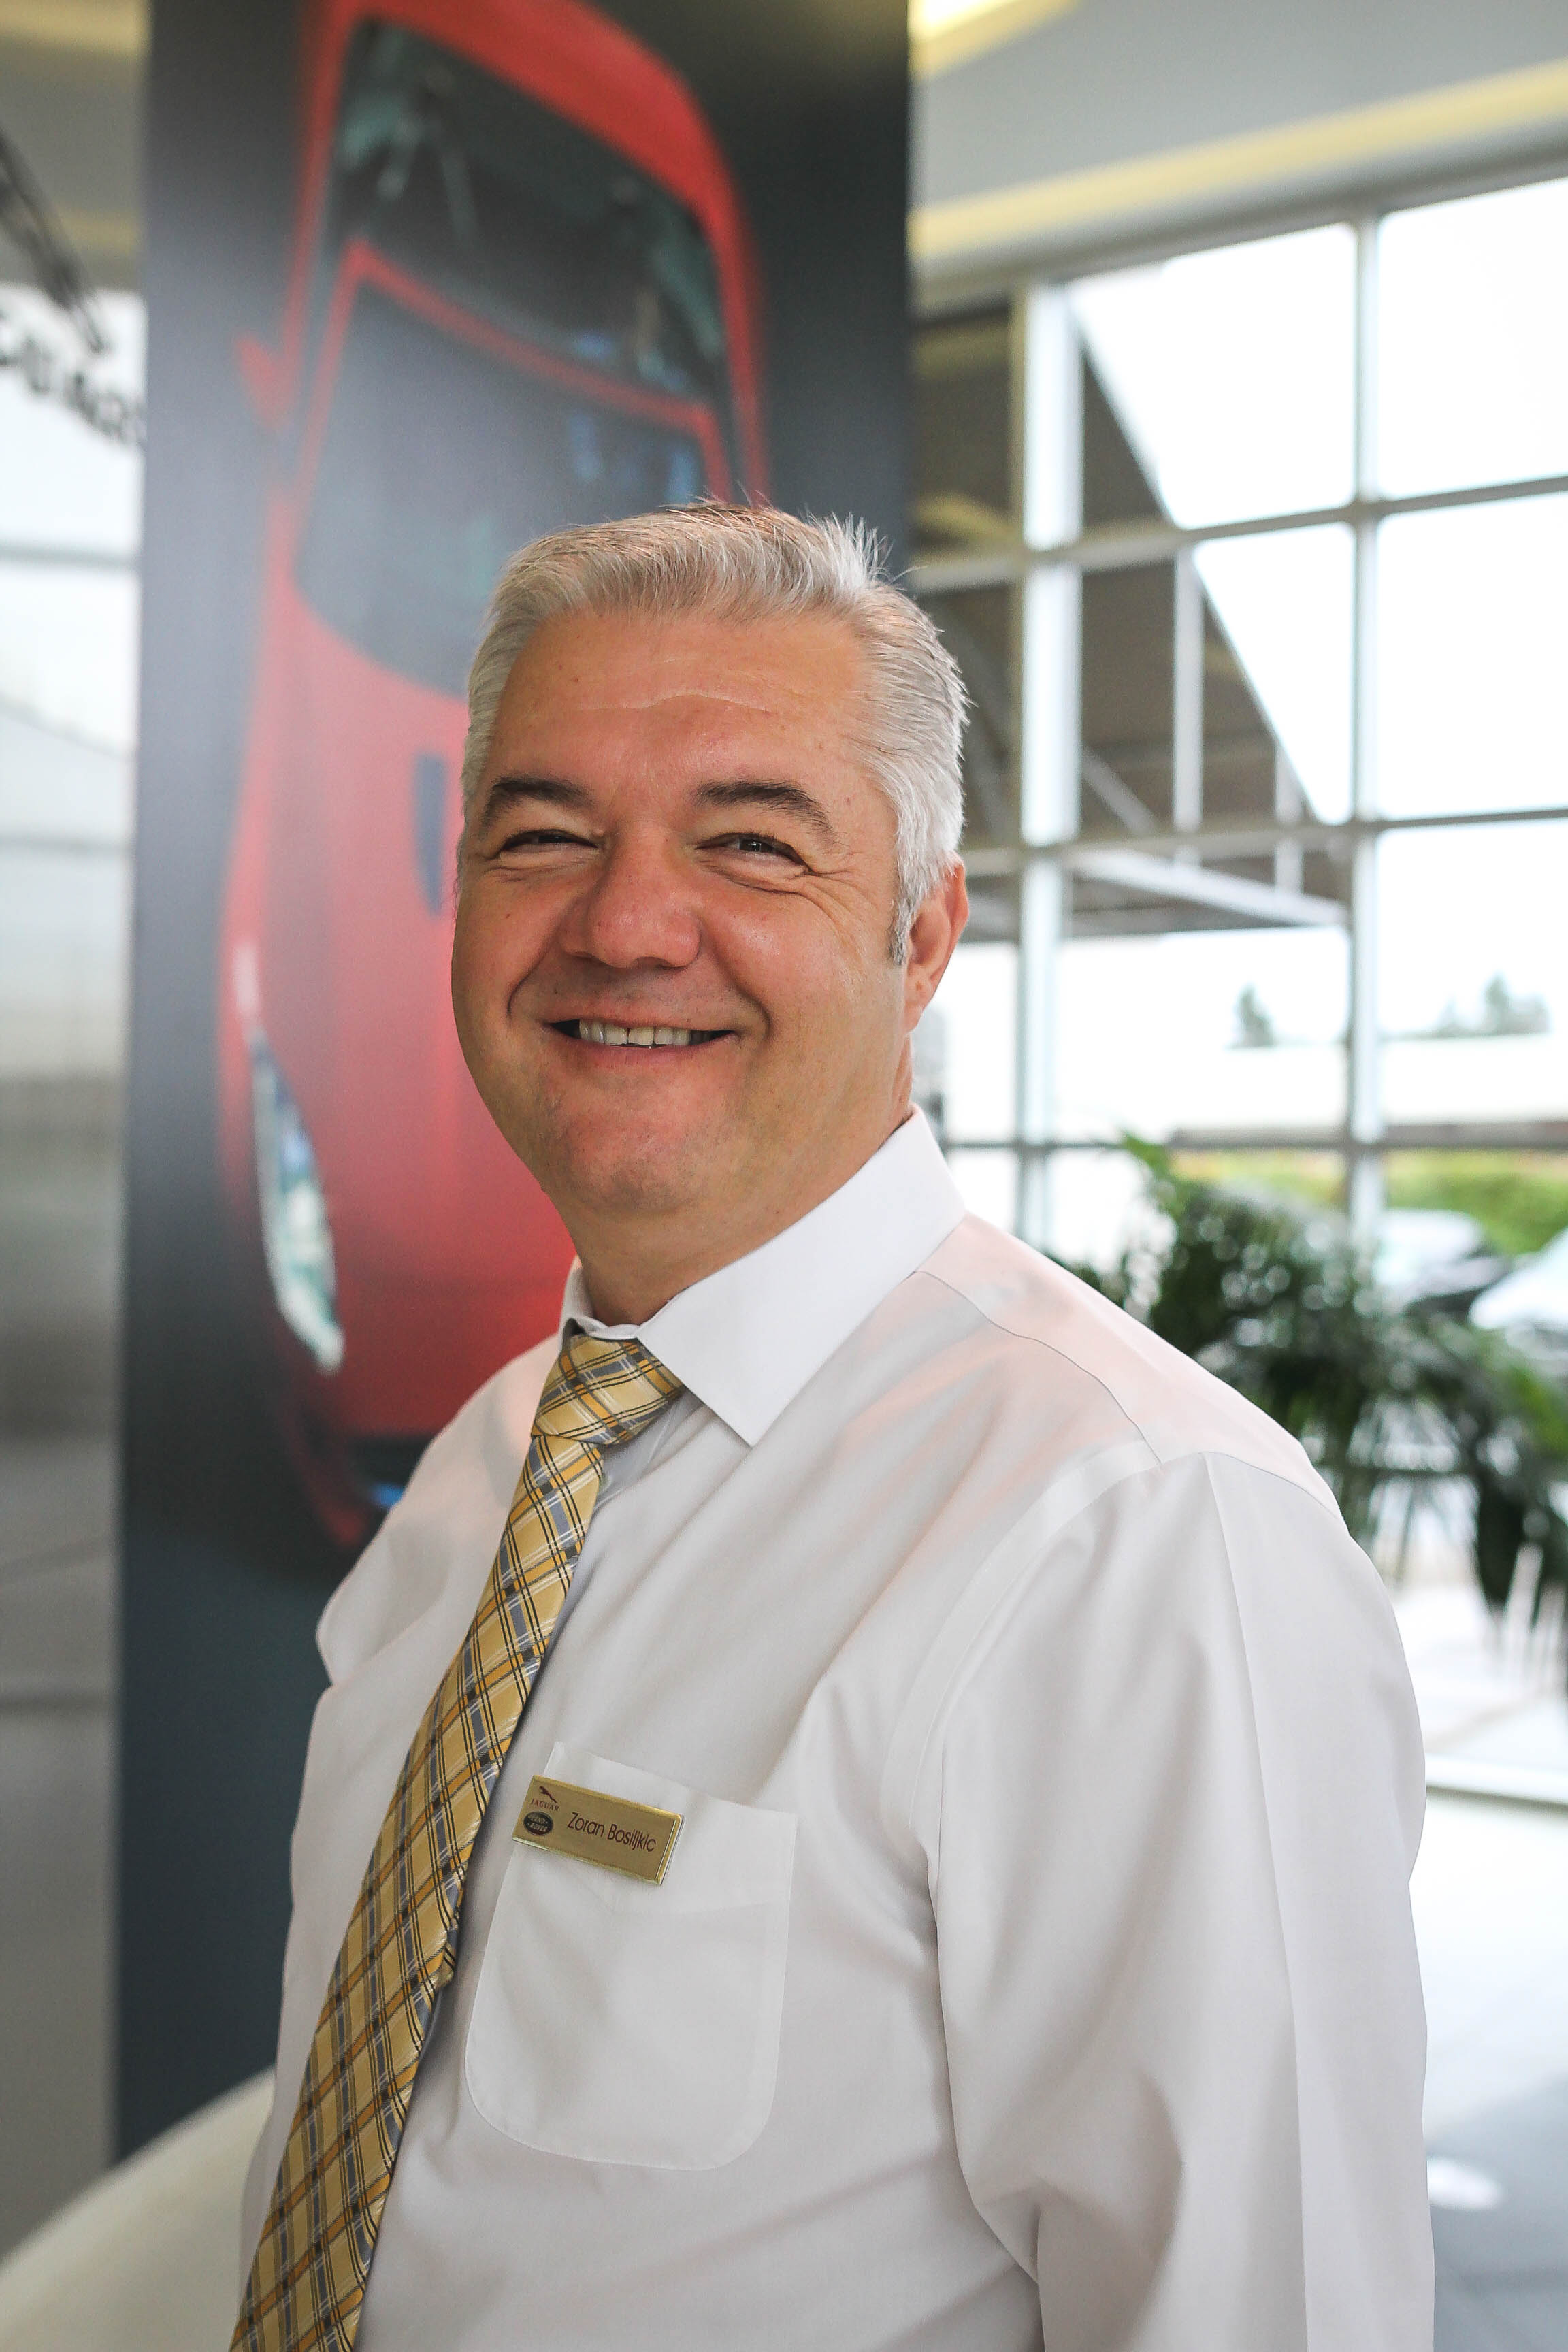 Zoran Bosiljkic